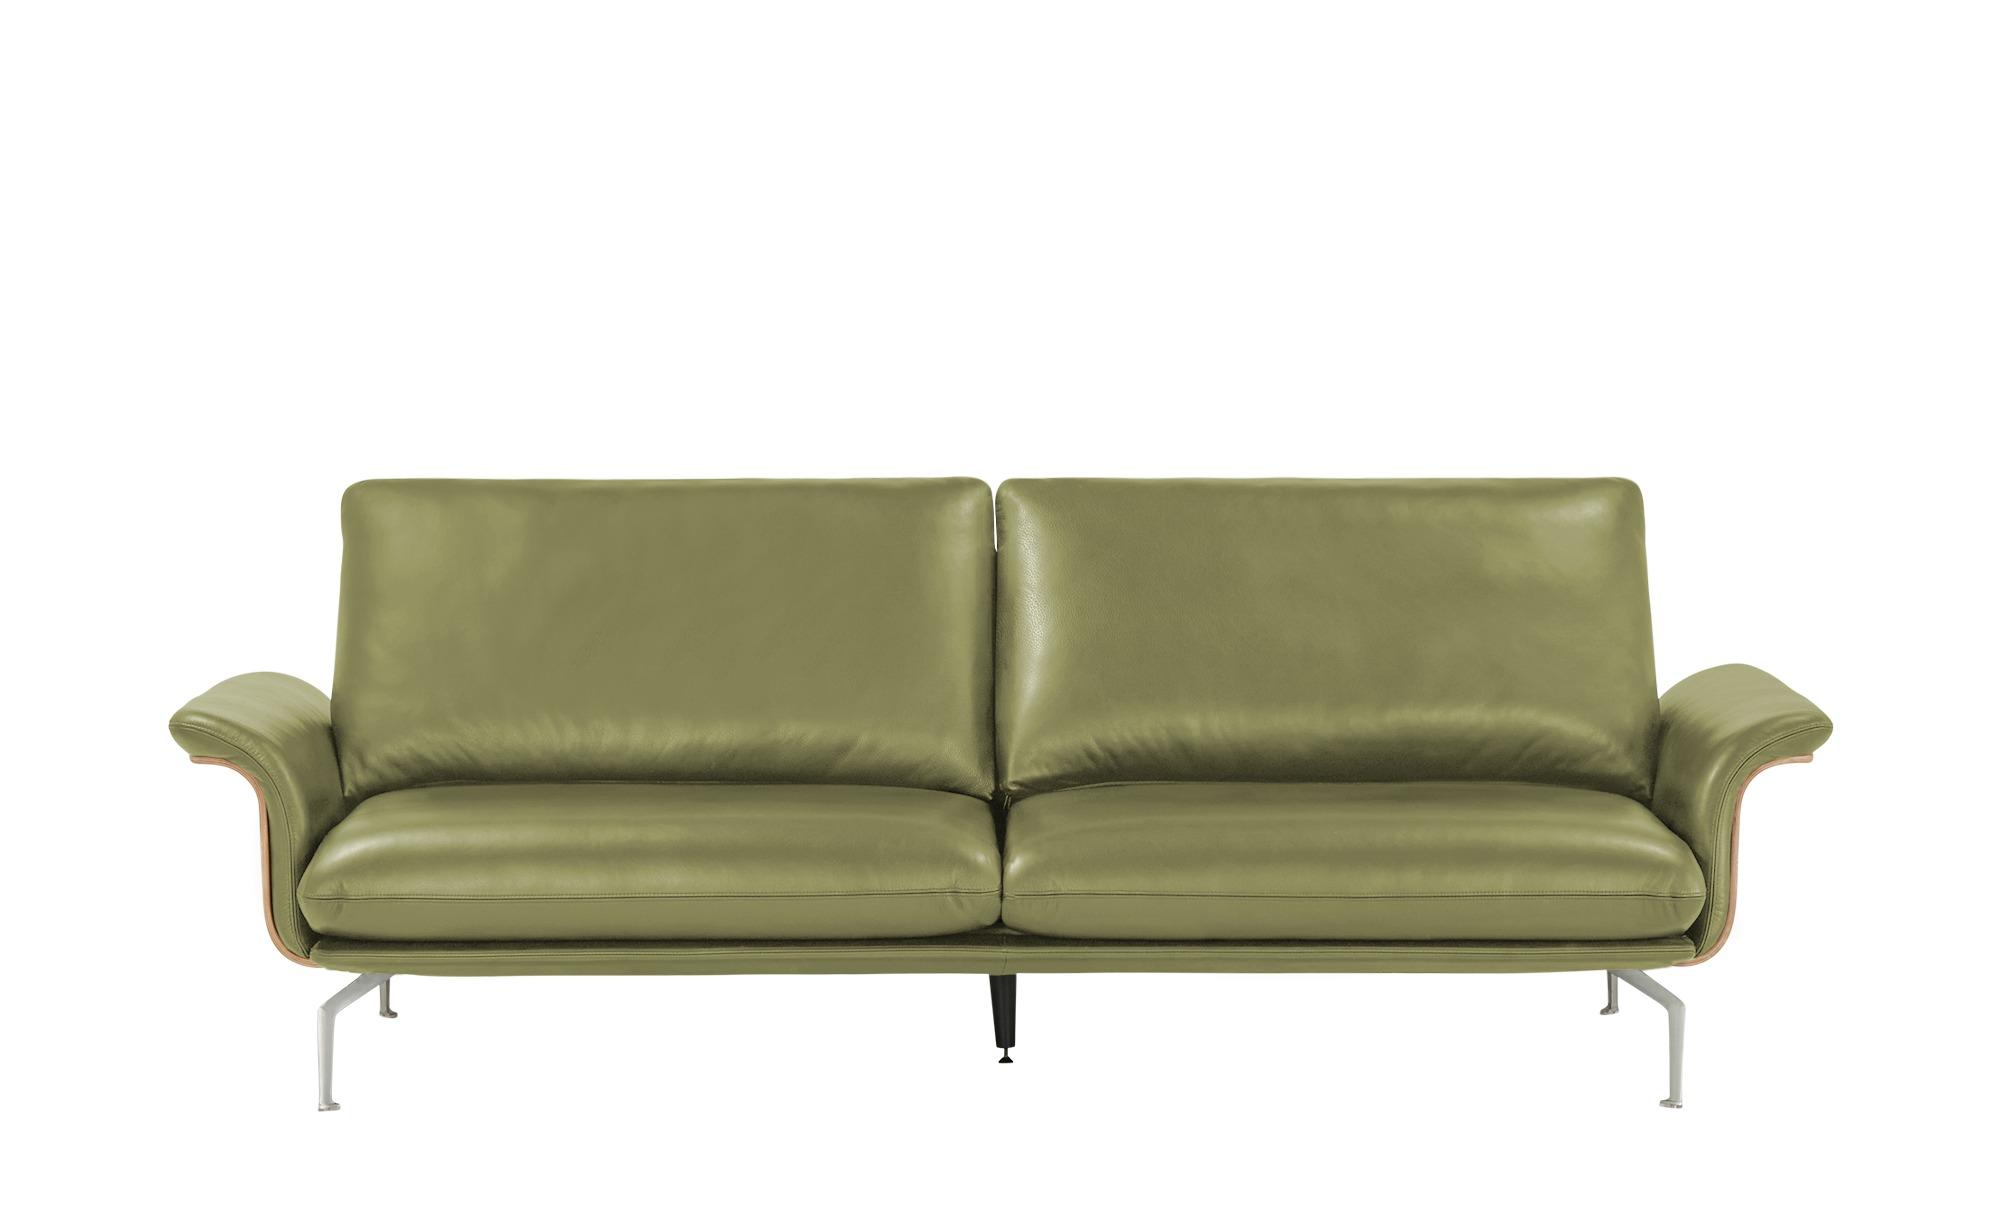 Nils Olsen Ledersofa  Alva ¦ grün ¦ Maße (cm): B: 244 H: 87 T: 101 Polstermöbel > Sofas > 3-Sitzer - Höffner